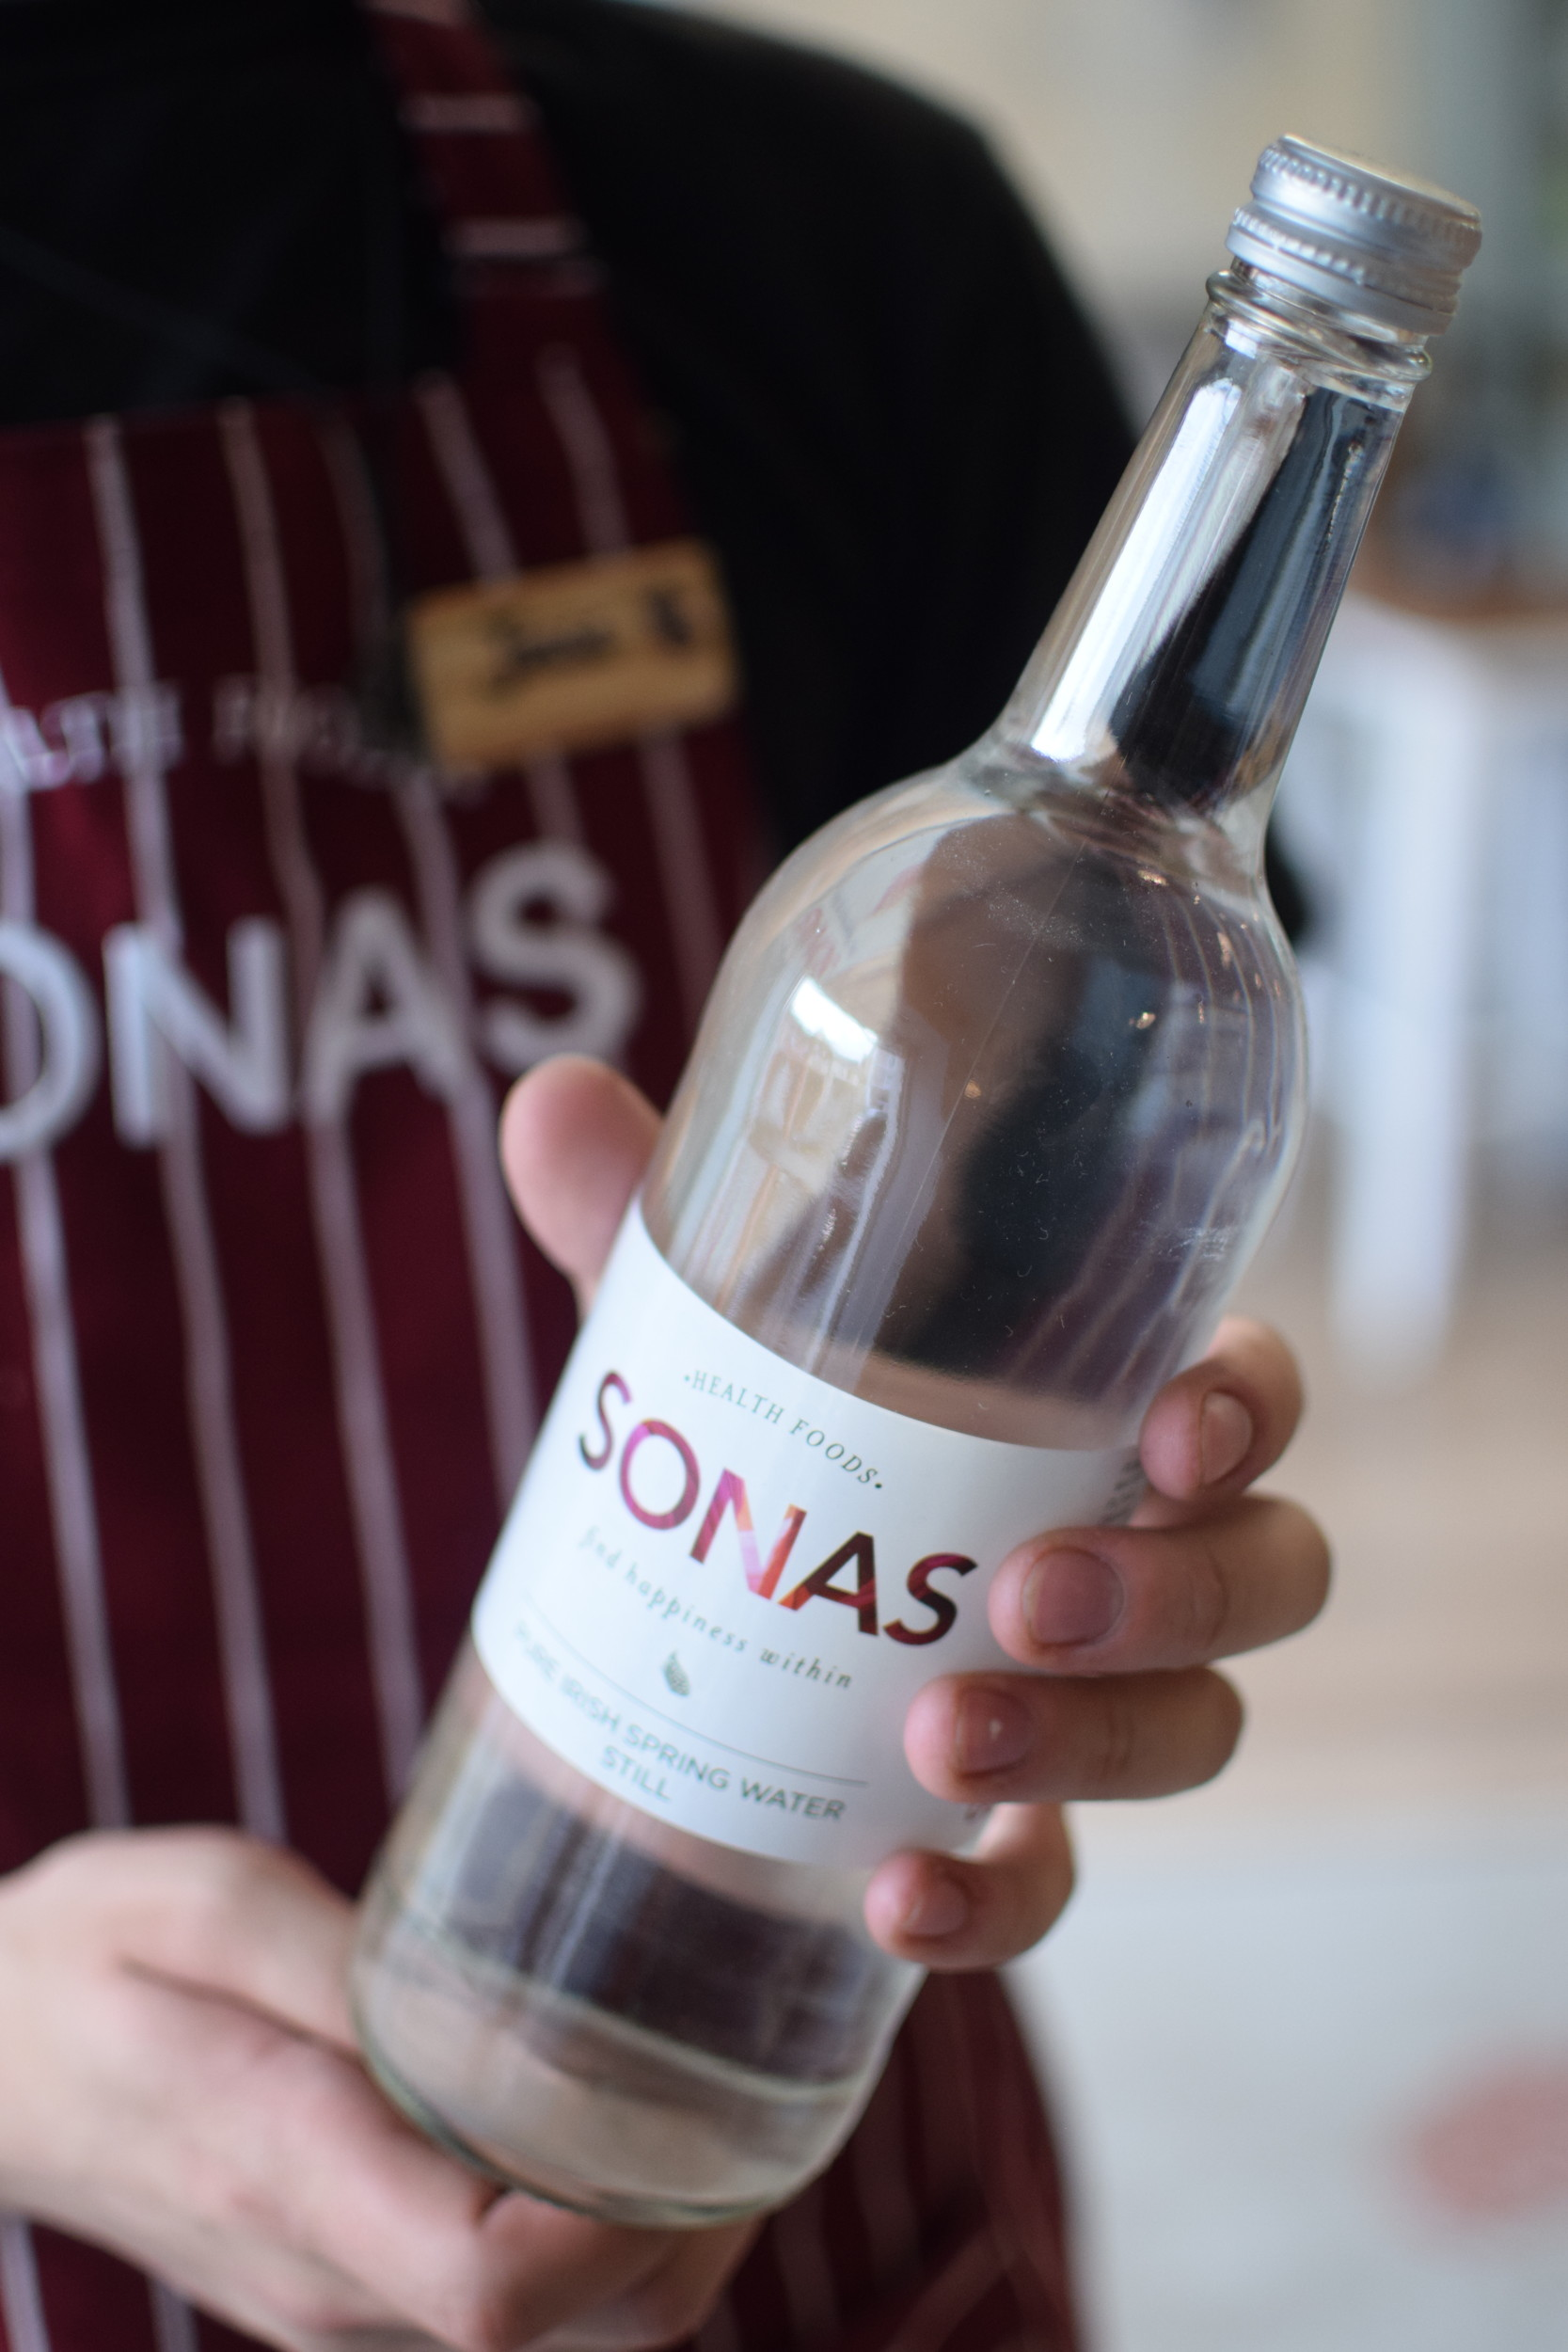 Sonas Water in Hand.JPG